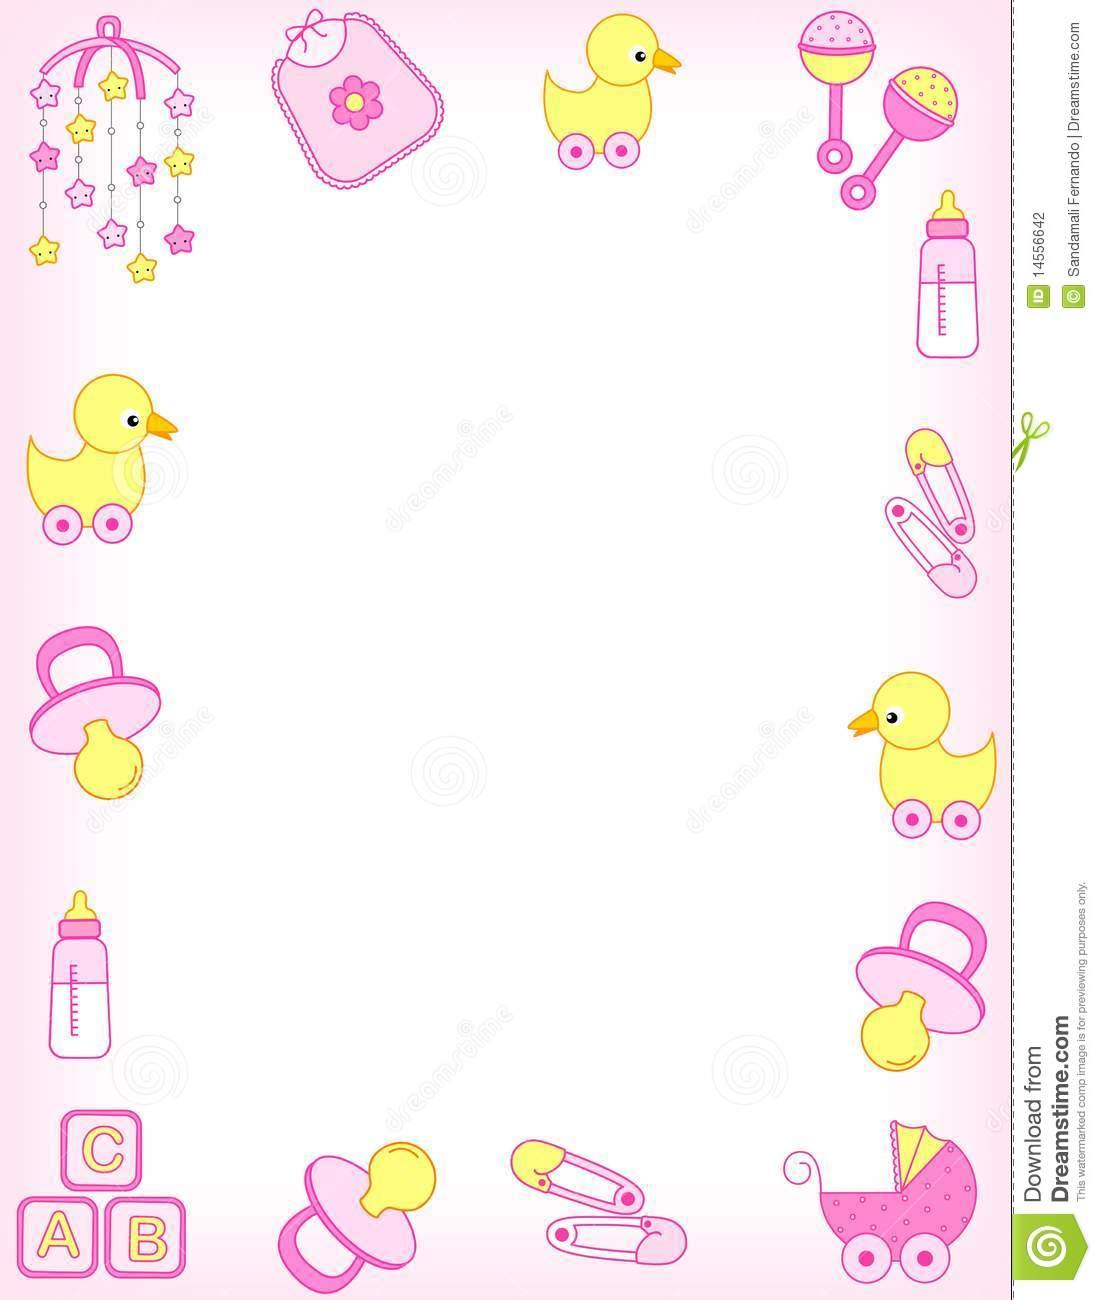 Baby clipart frame Shower Topsfld frame Shower Collection